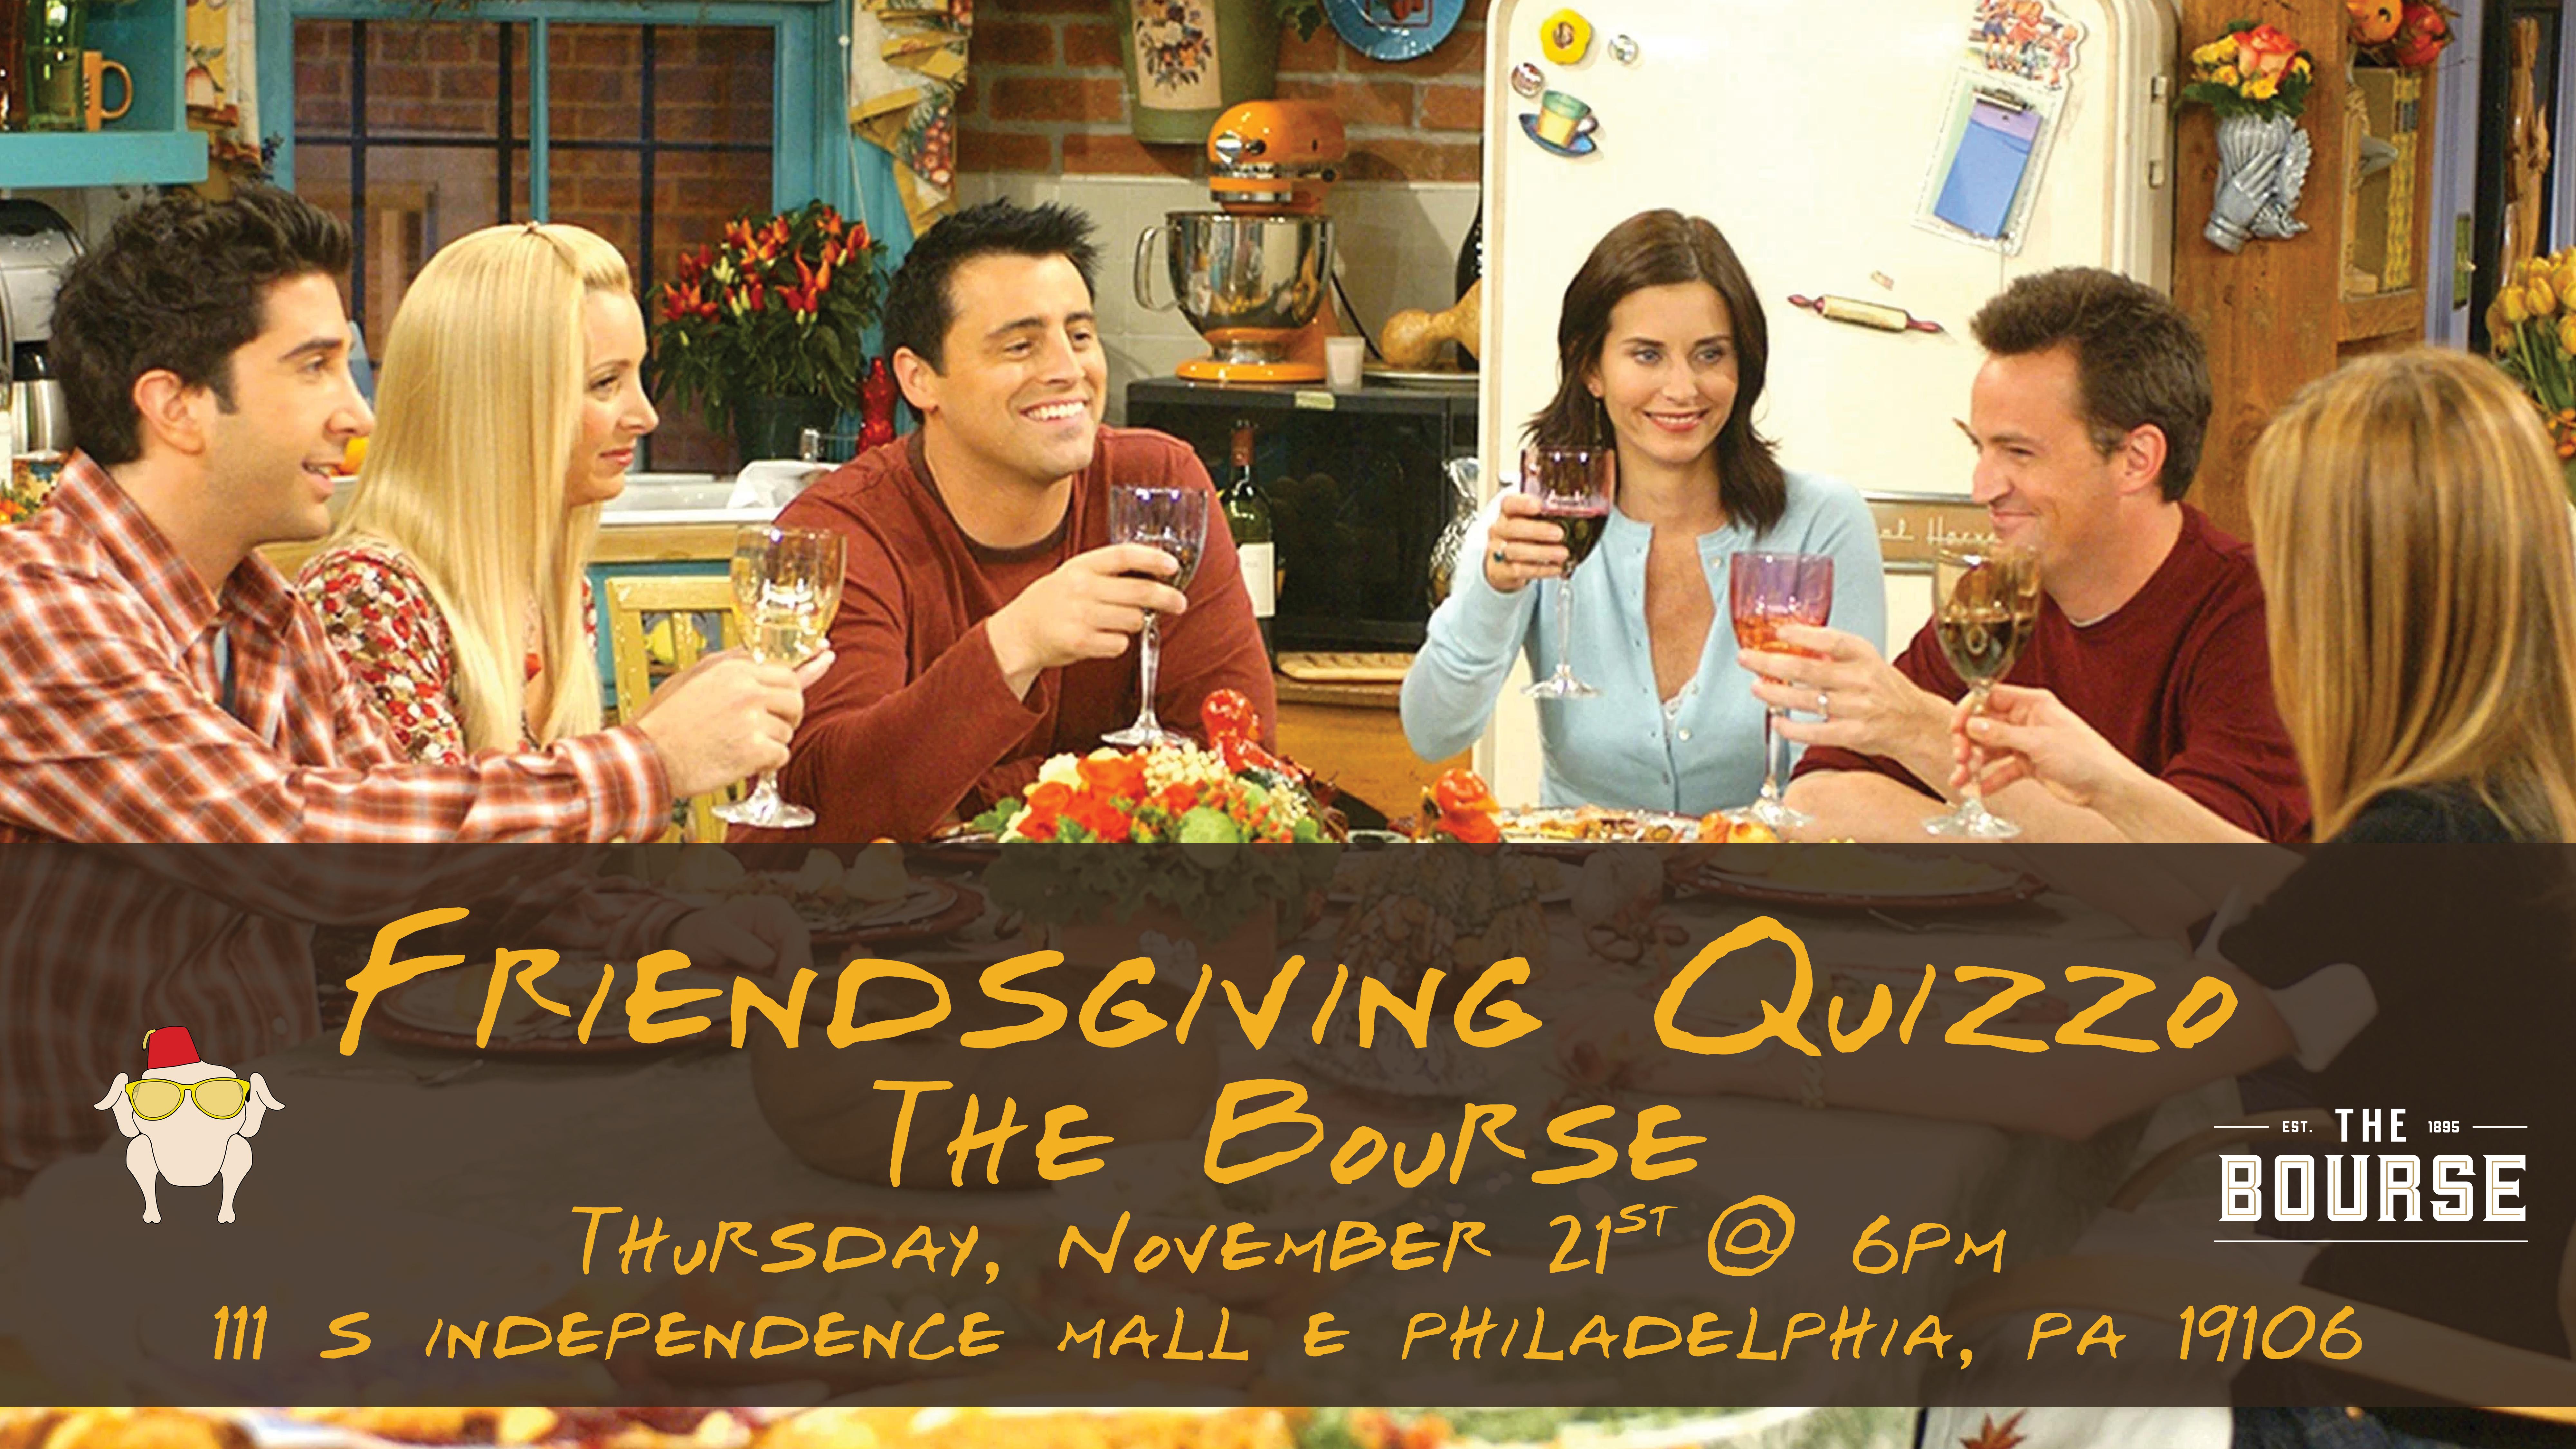 Friendsgiving quizzo